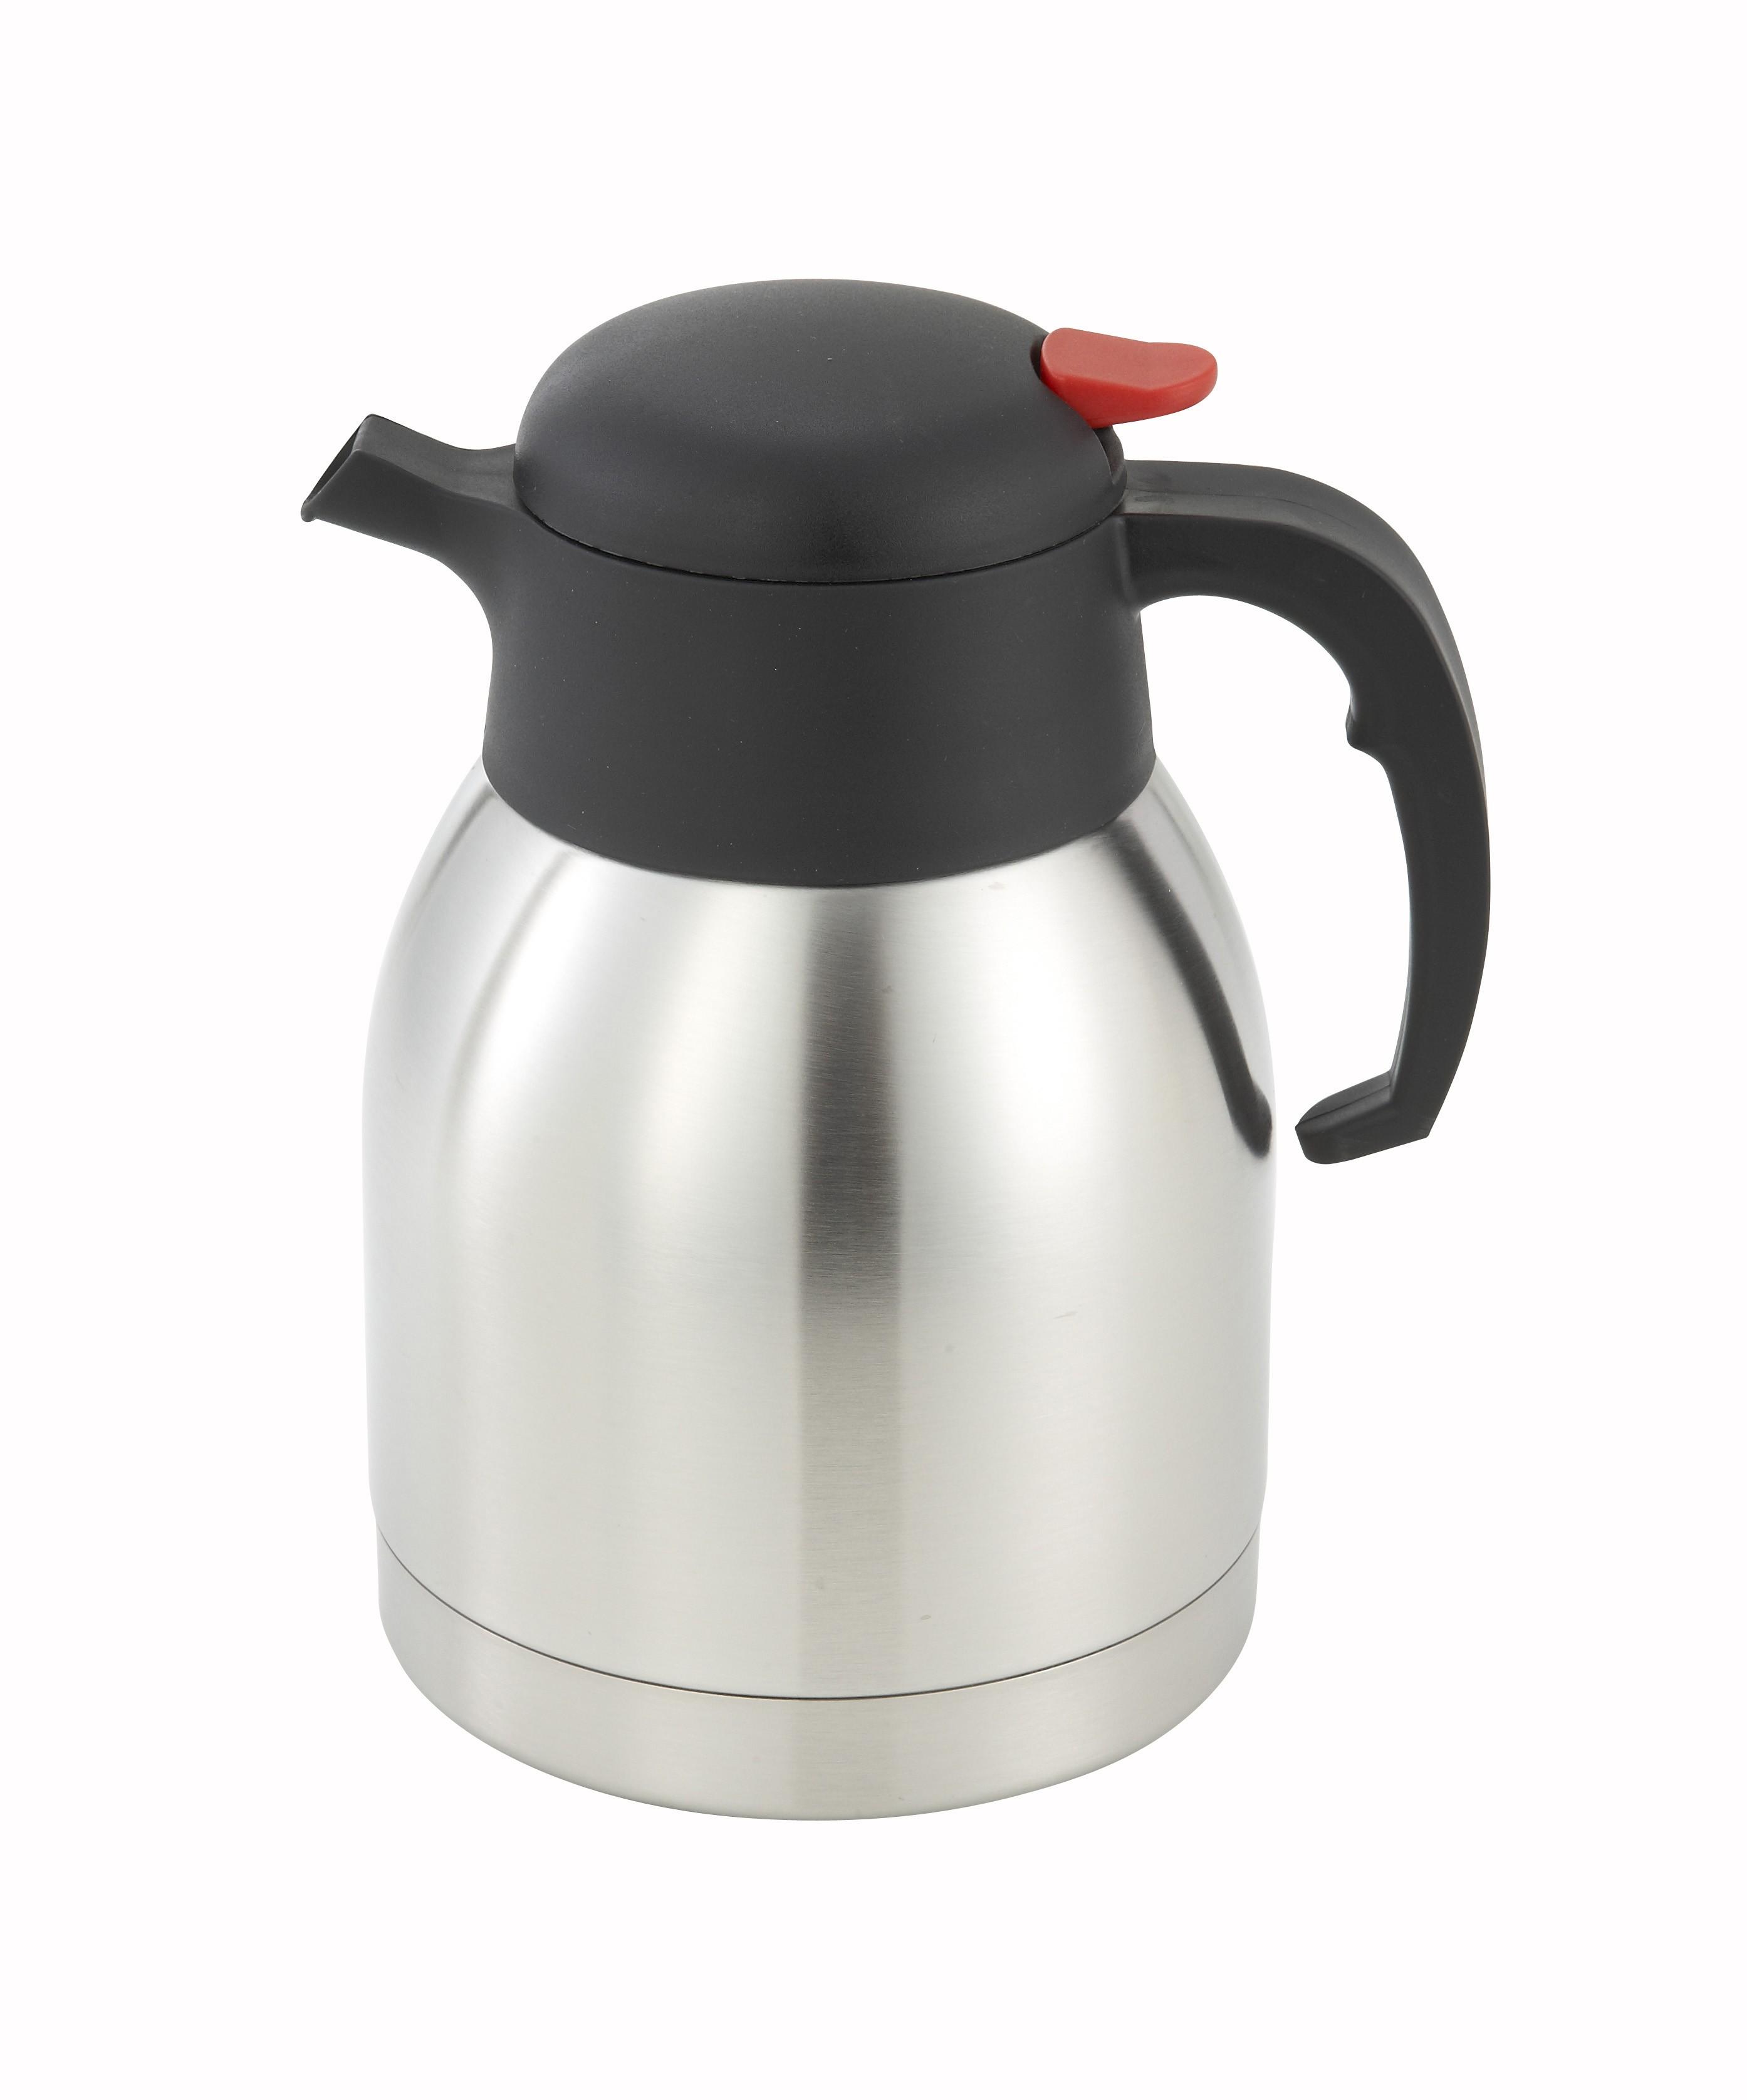 Winco CF-1.5 Stainless Steel Carafe 1.5 Liter